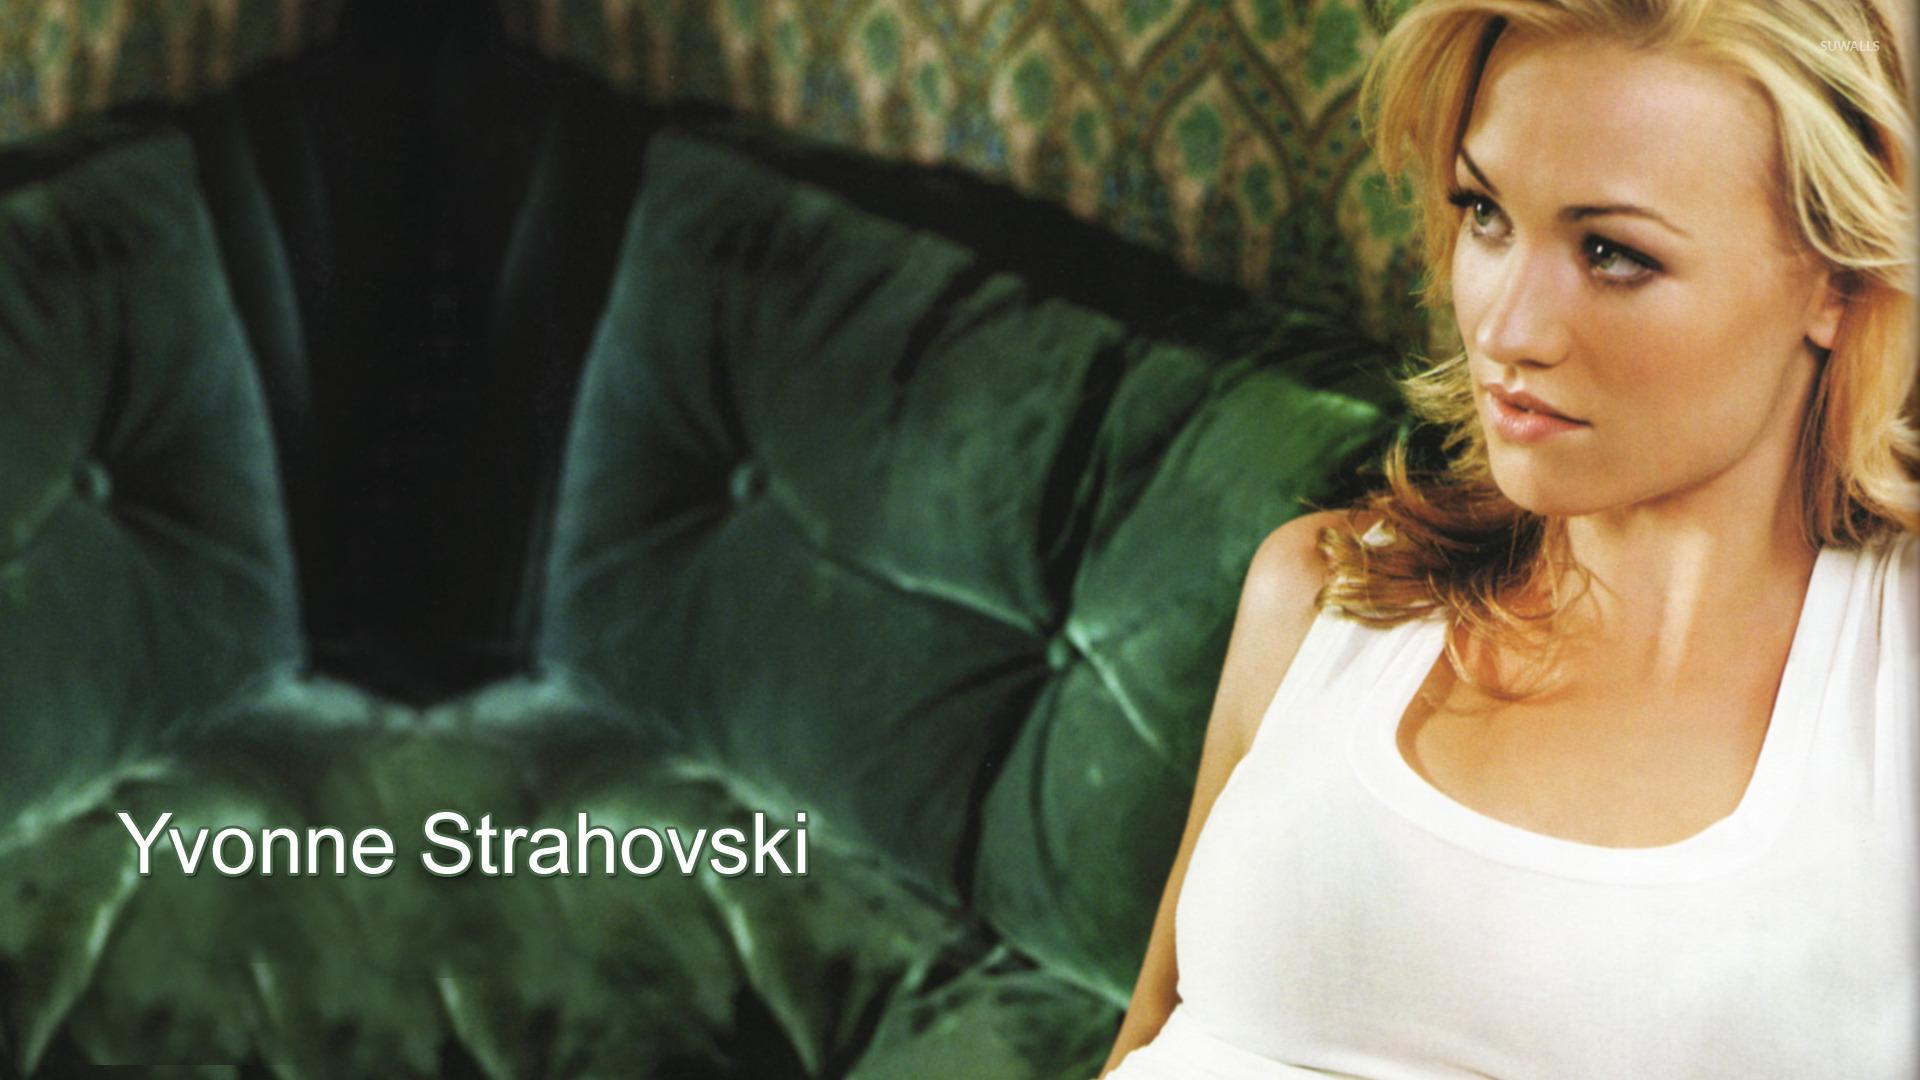 Yvonne strahovski wallpaper 1080p yvonne strahovski 533 1920x1080